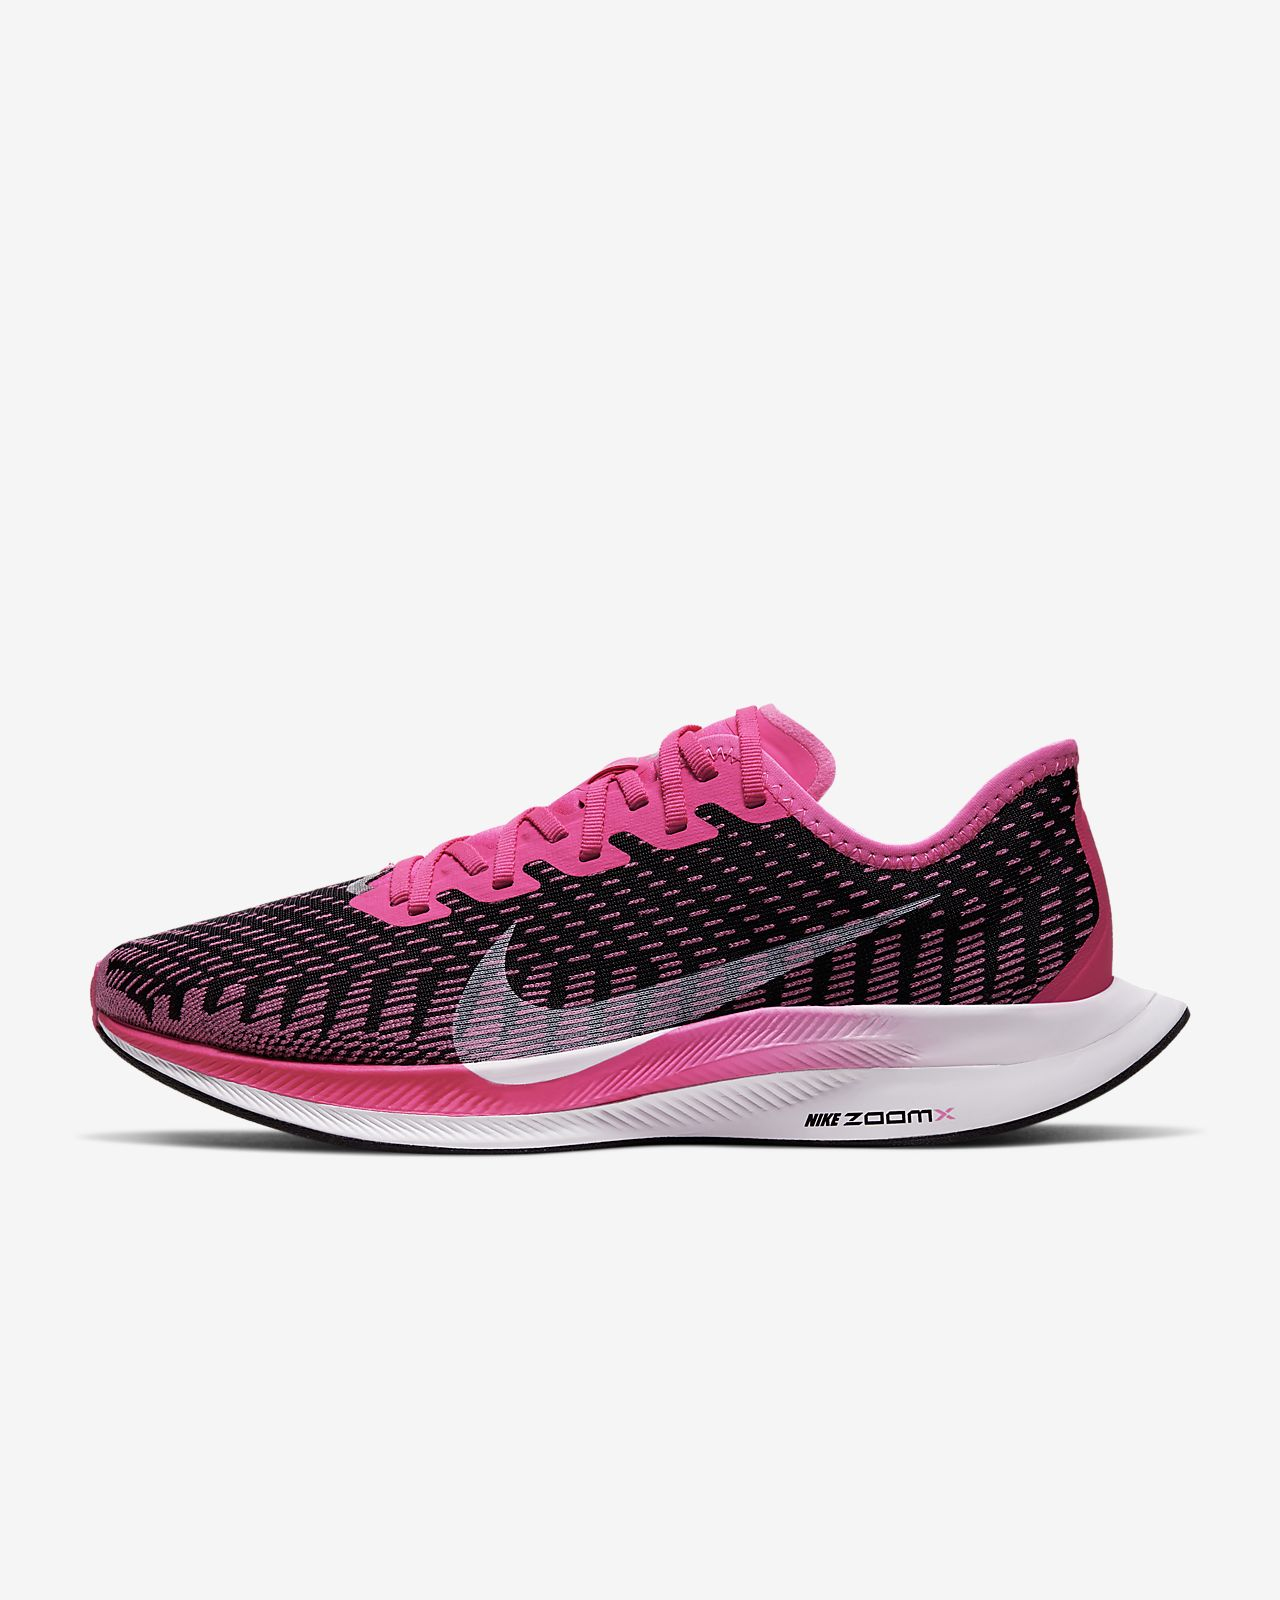 Löparsko Nike Zoom Pegasus Turbo 2 för kvinnor